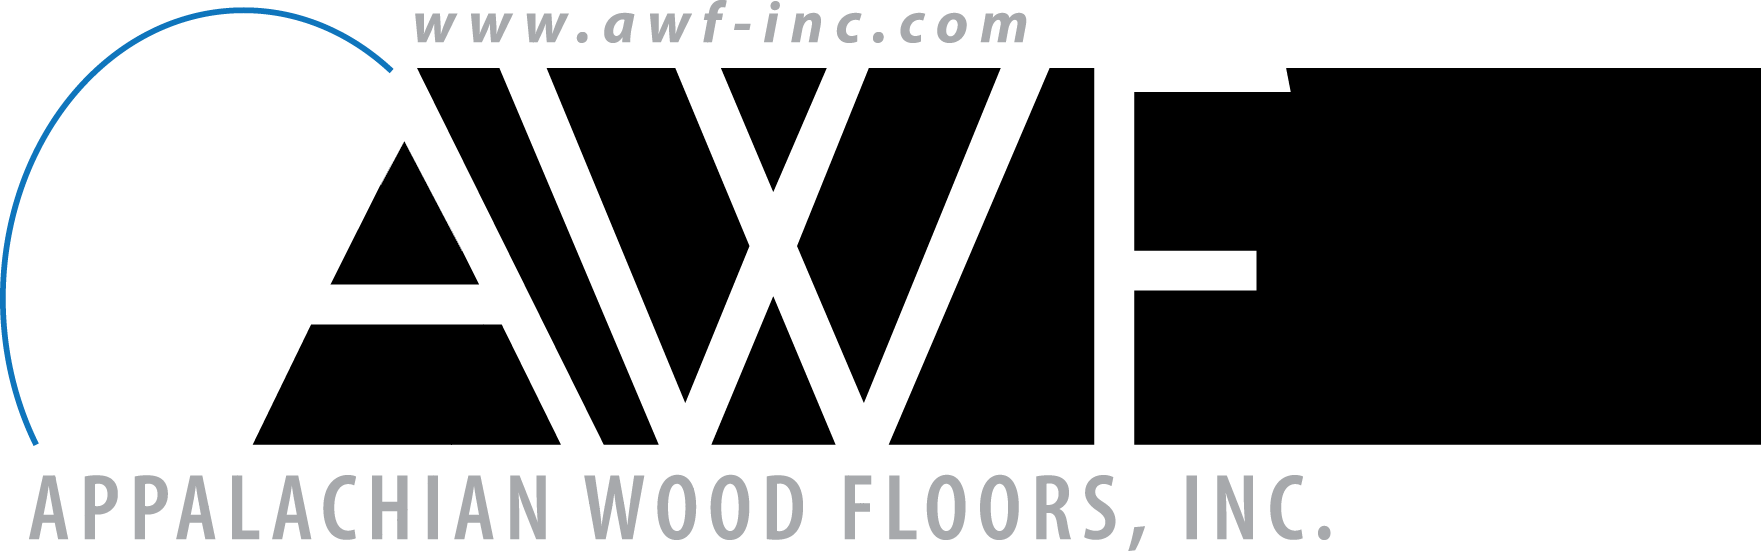 awf | appalachian wood floors